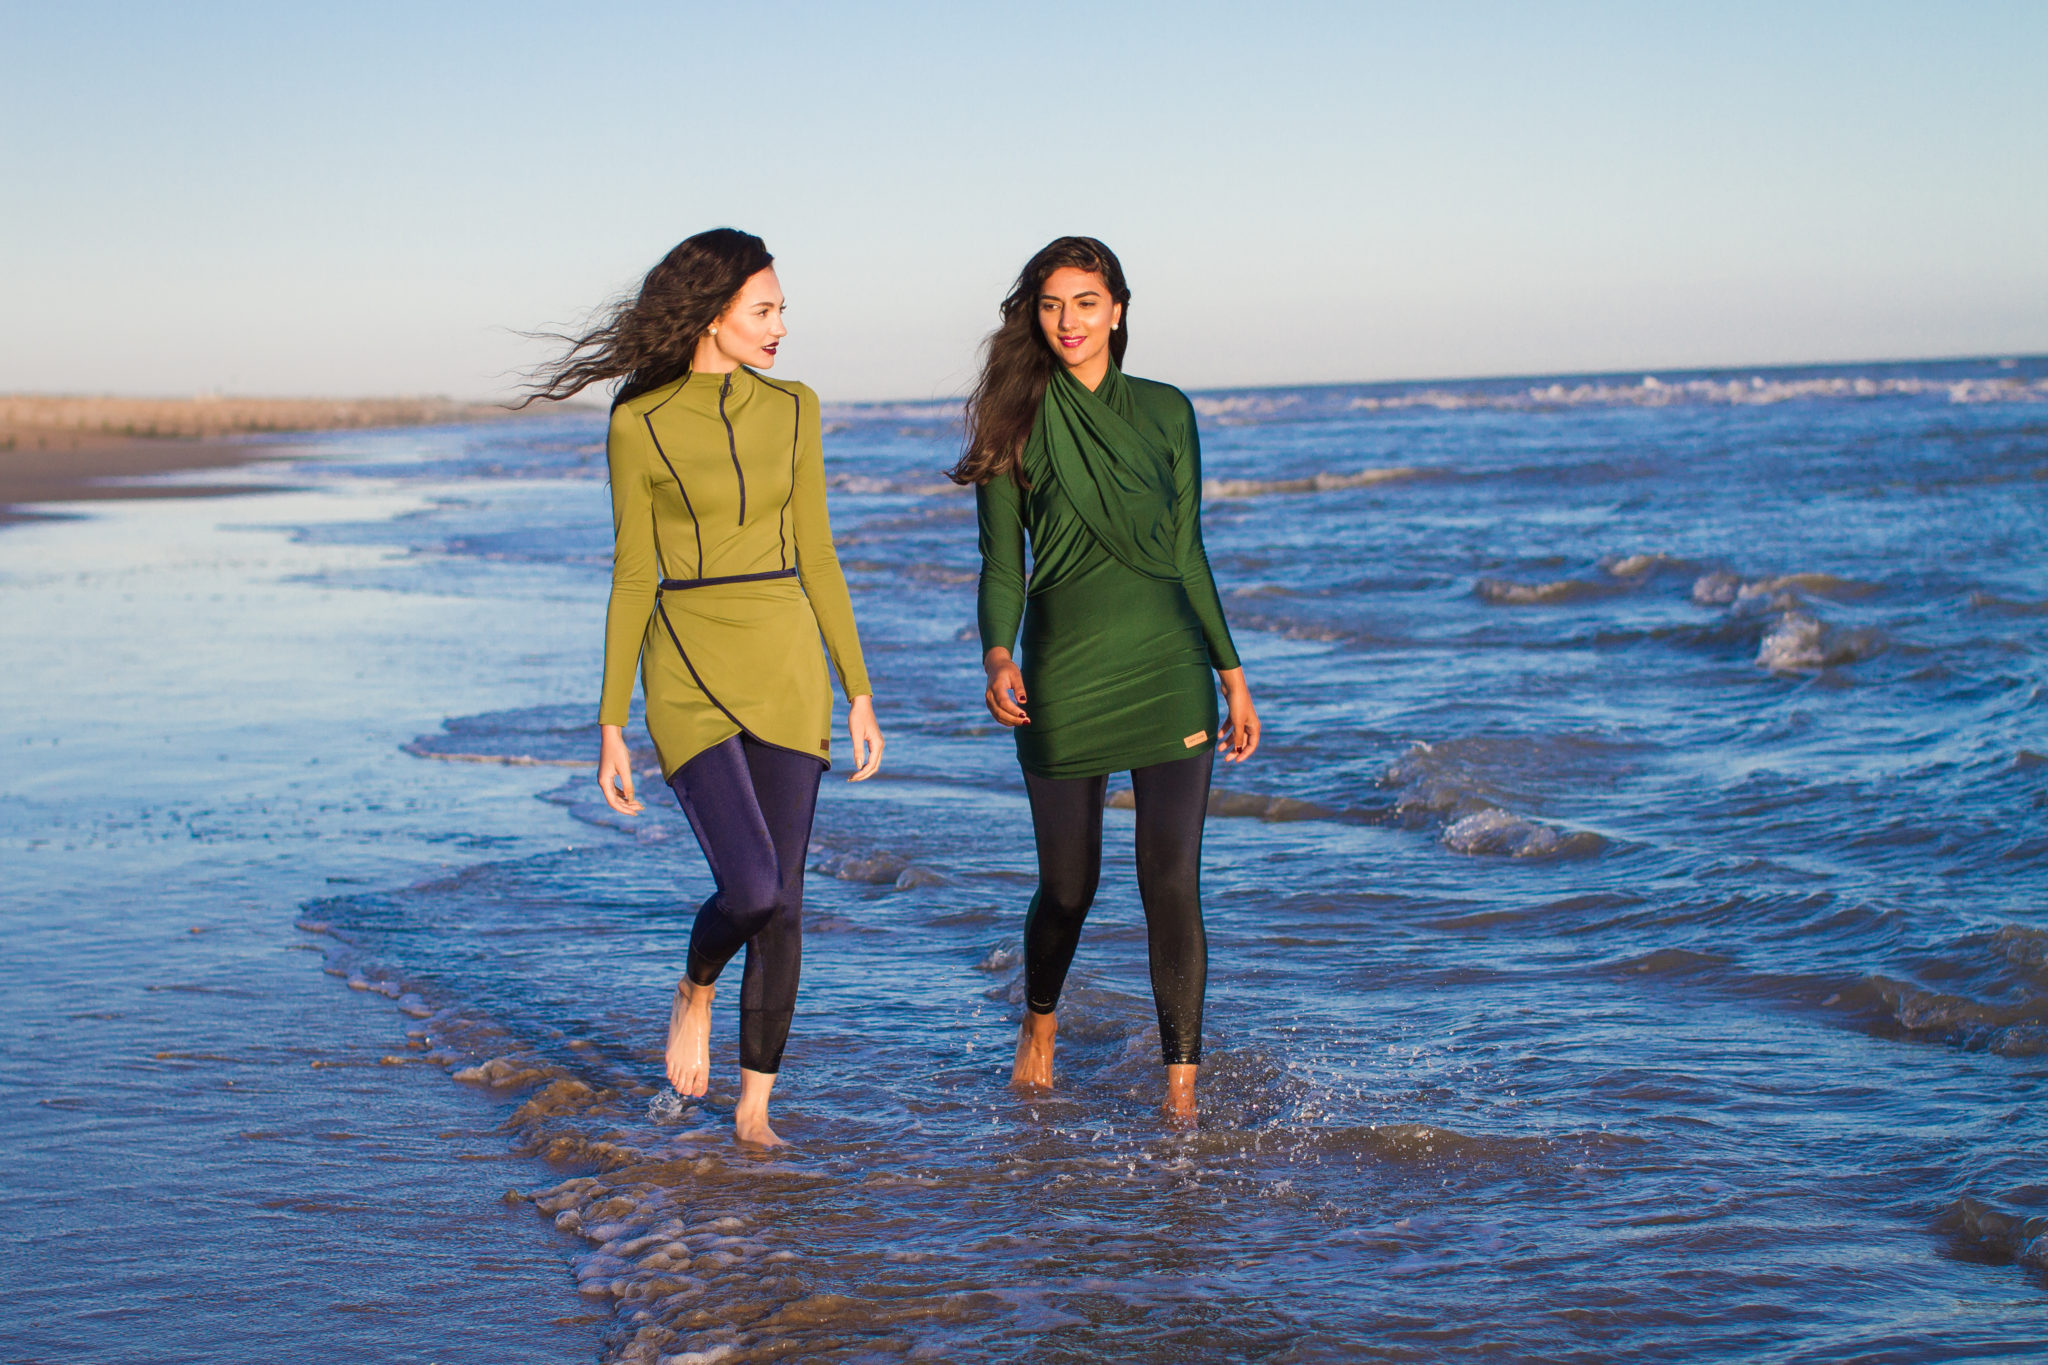 Breakthrough Stylish and Modest Swimwear -